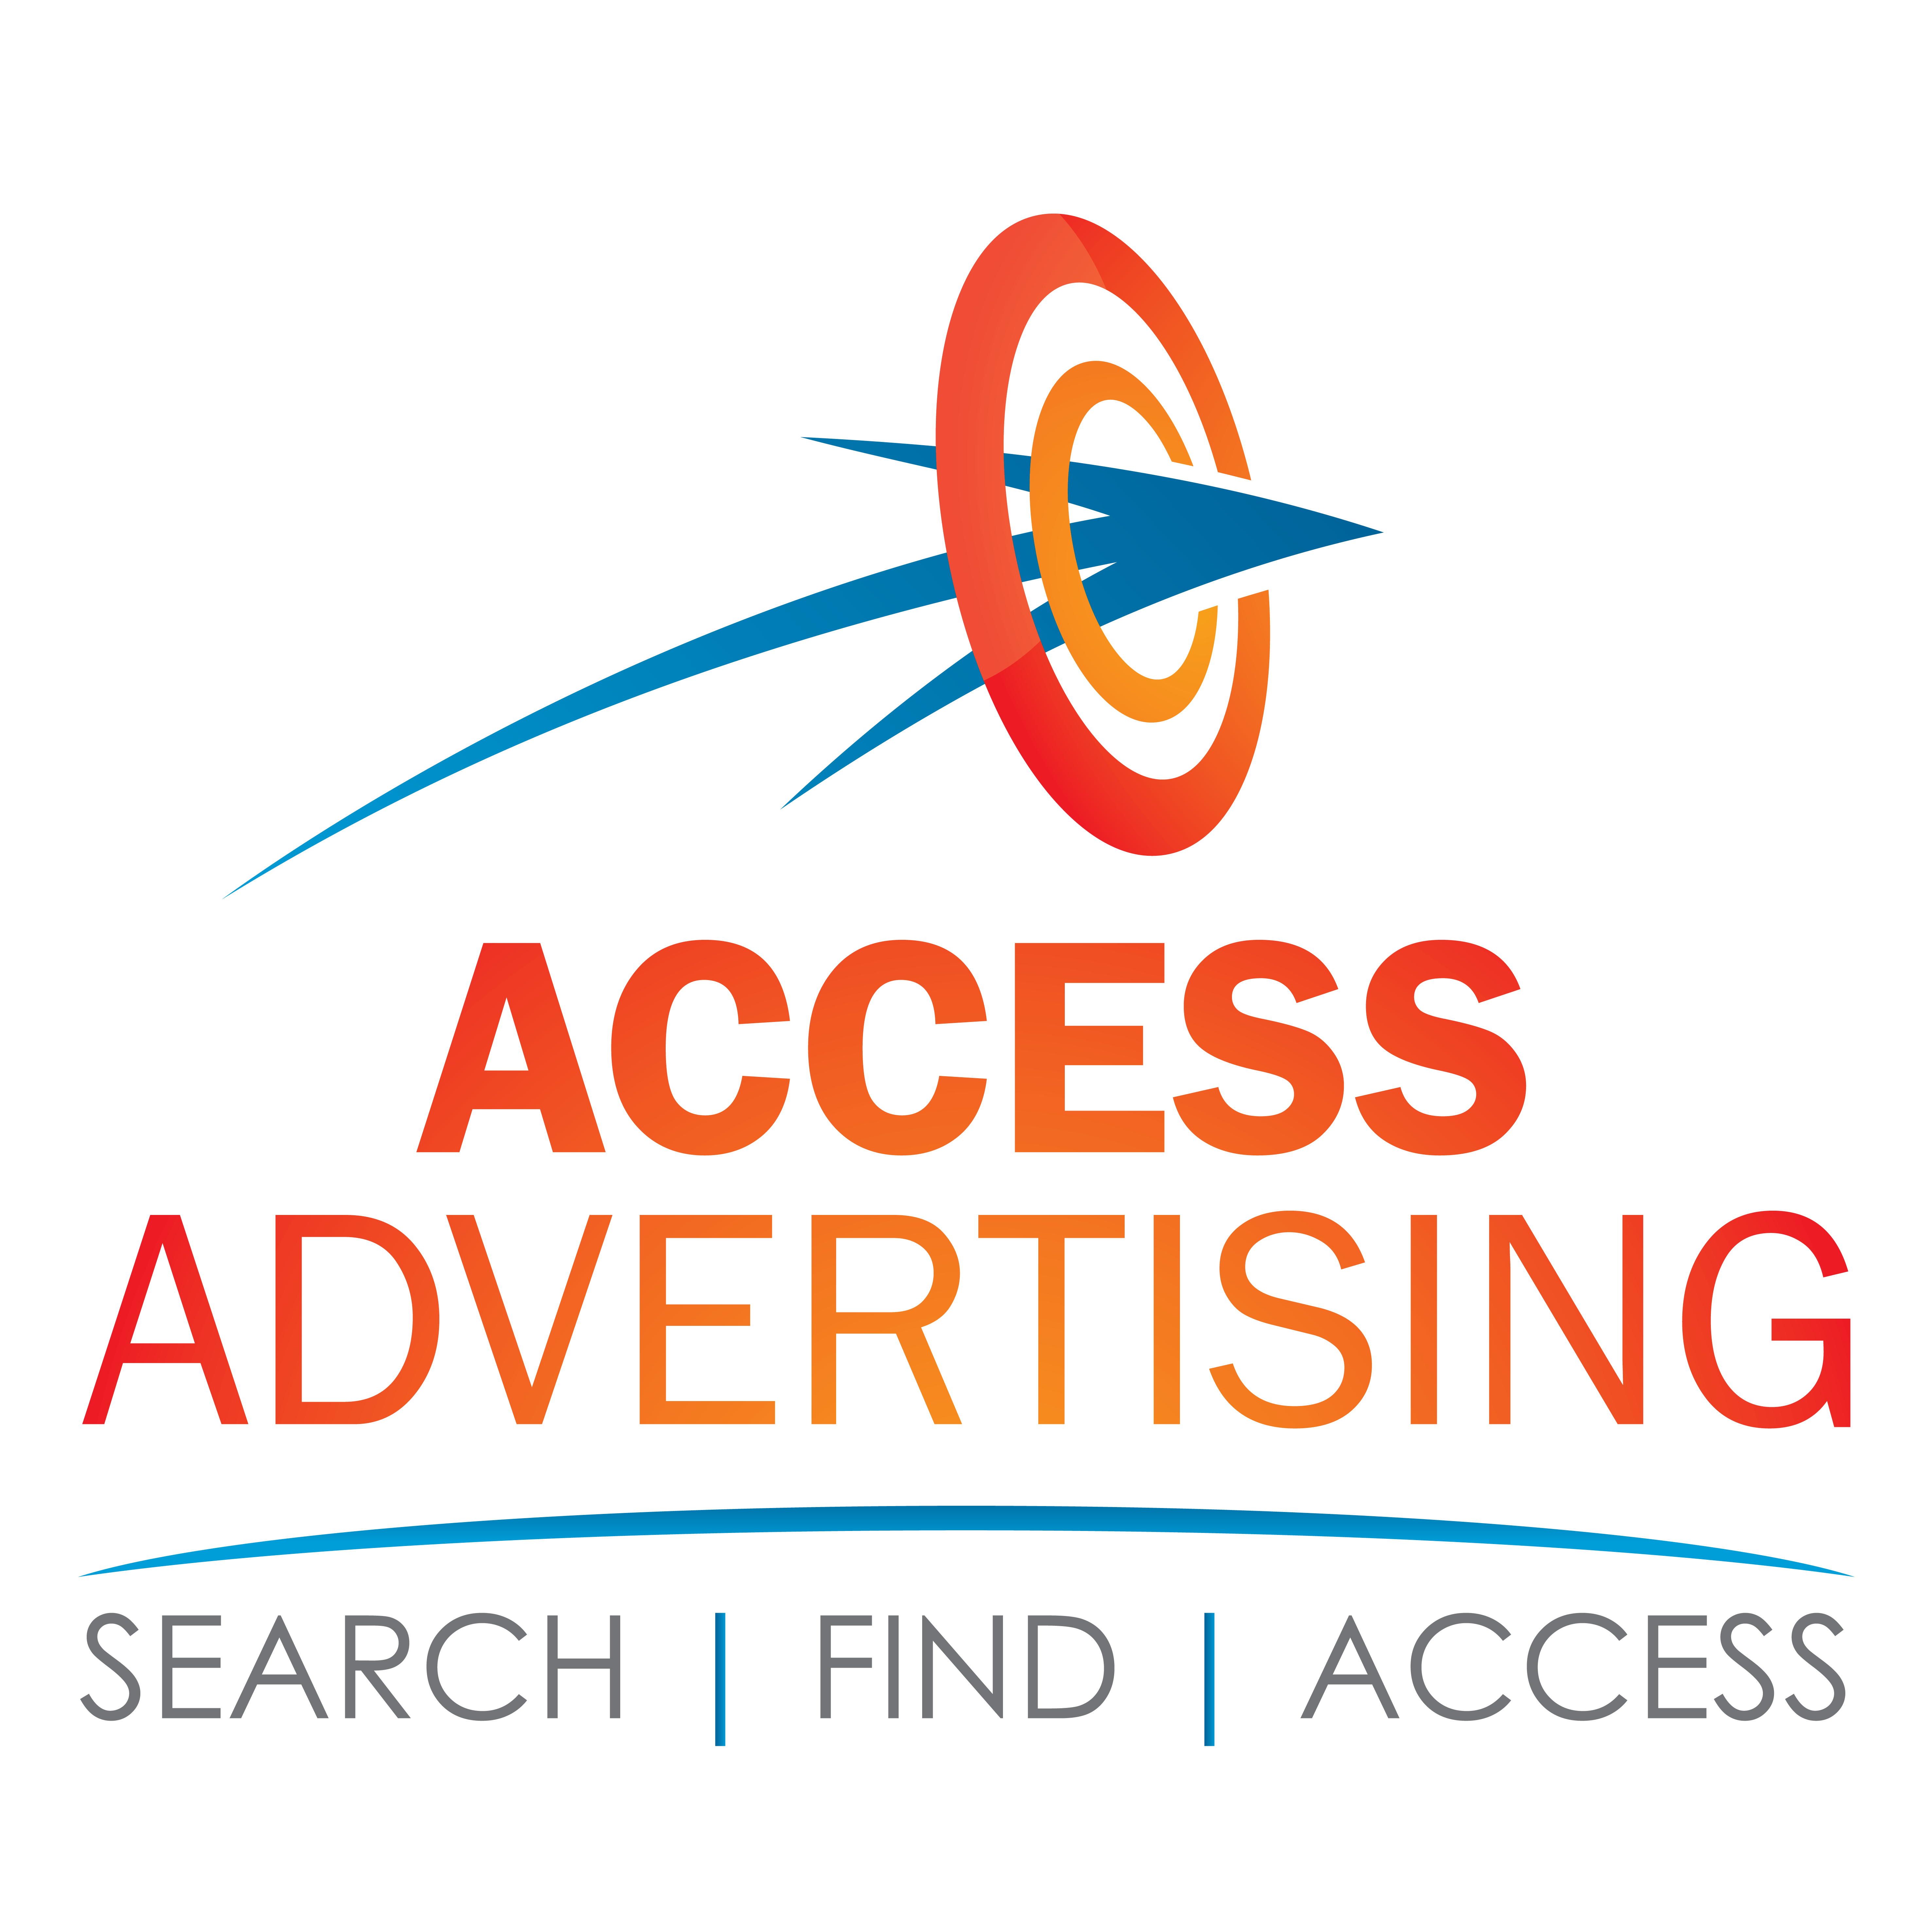 Access Advertising Logo Png - Access Advertising Logo Png Hdpng.com 5906, Transparent background PNG HD thumbnail